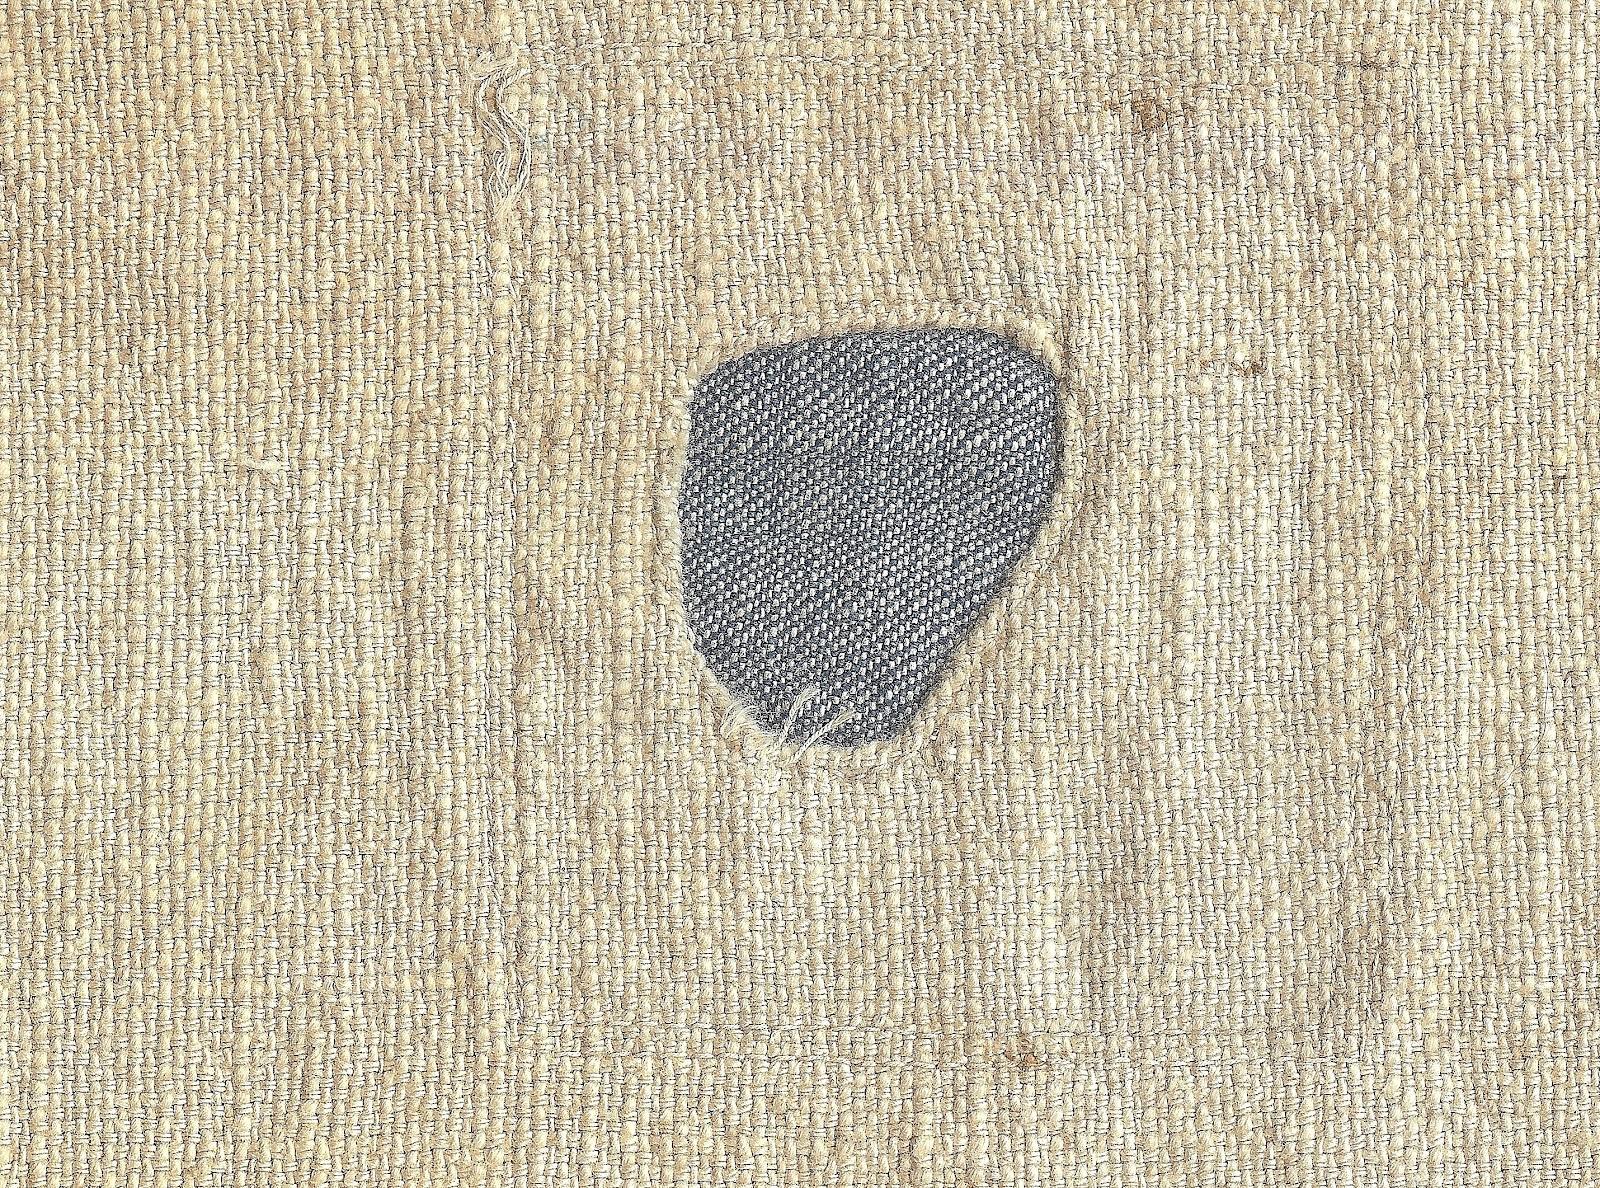 Antique Graphics Wednesday Grain Sacks Textures Knick